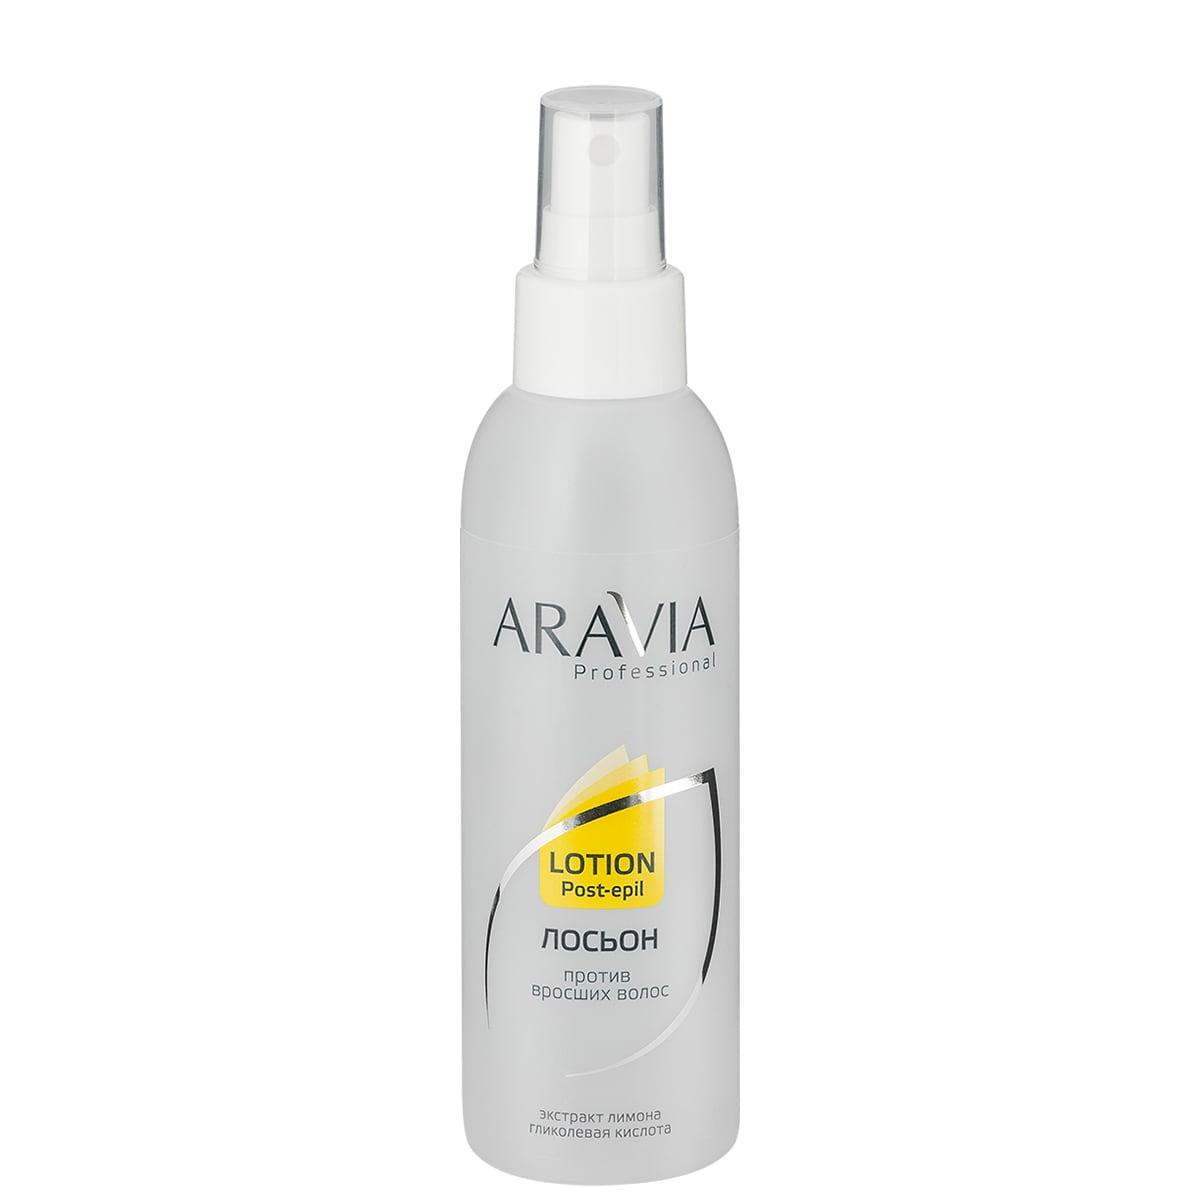 Lotion Anti вросших Hair Lemon, 150 Ml, Aravia Professional